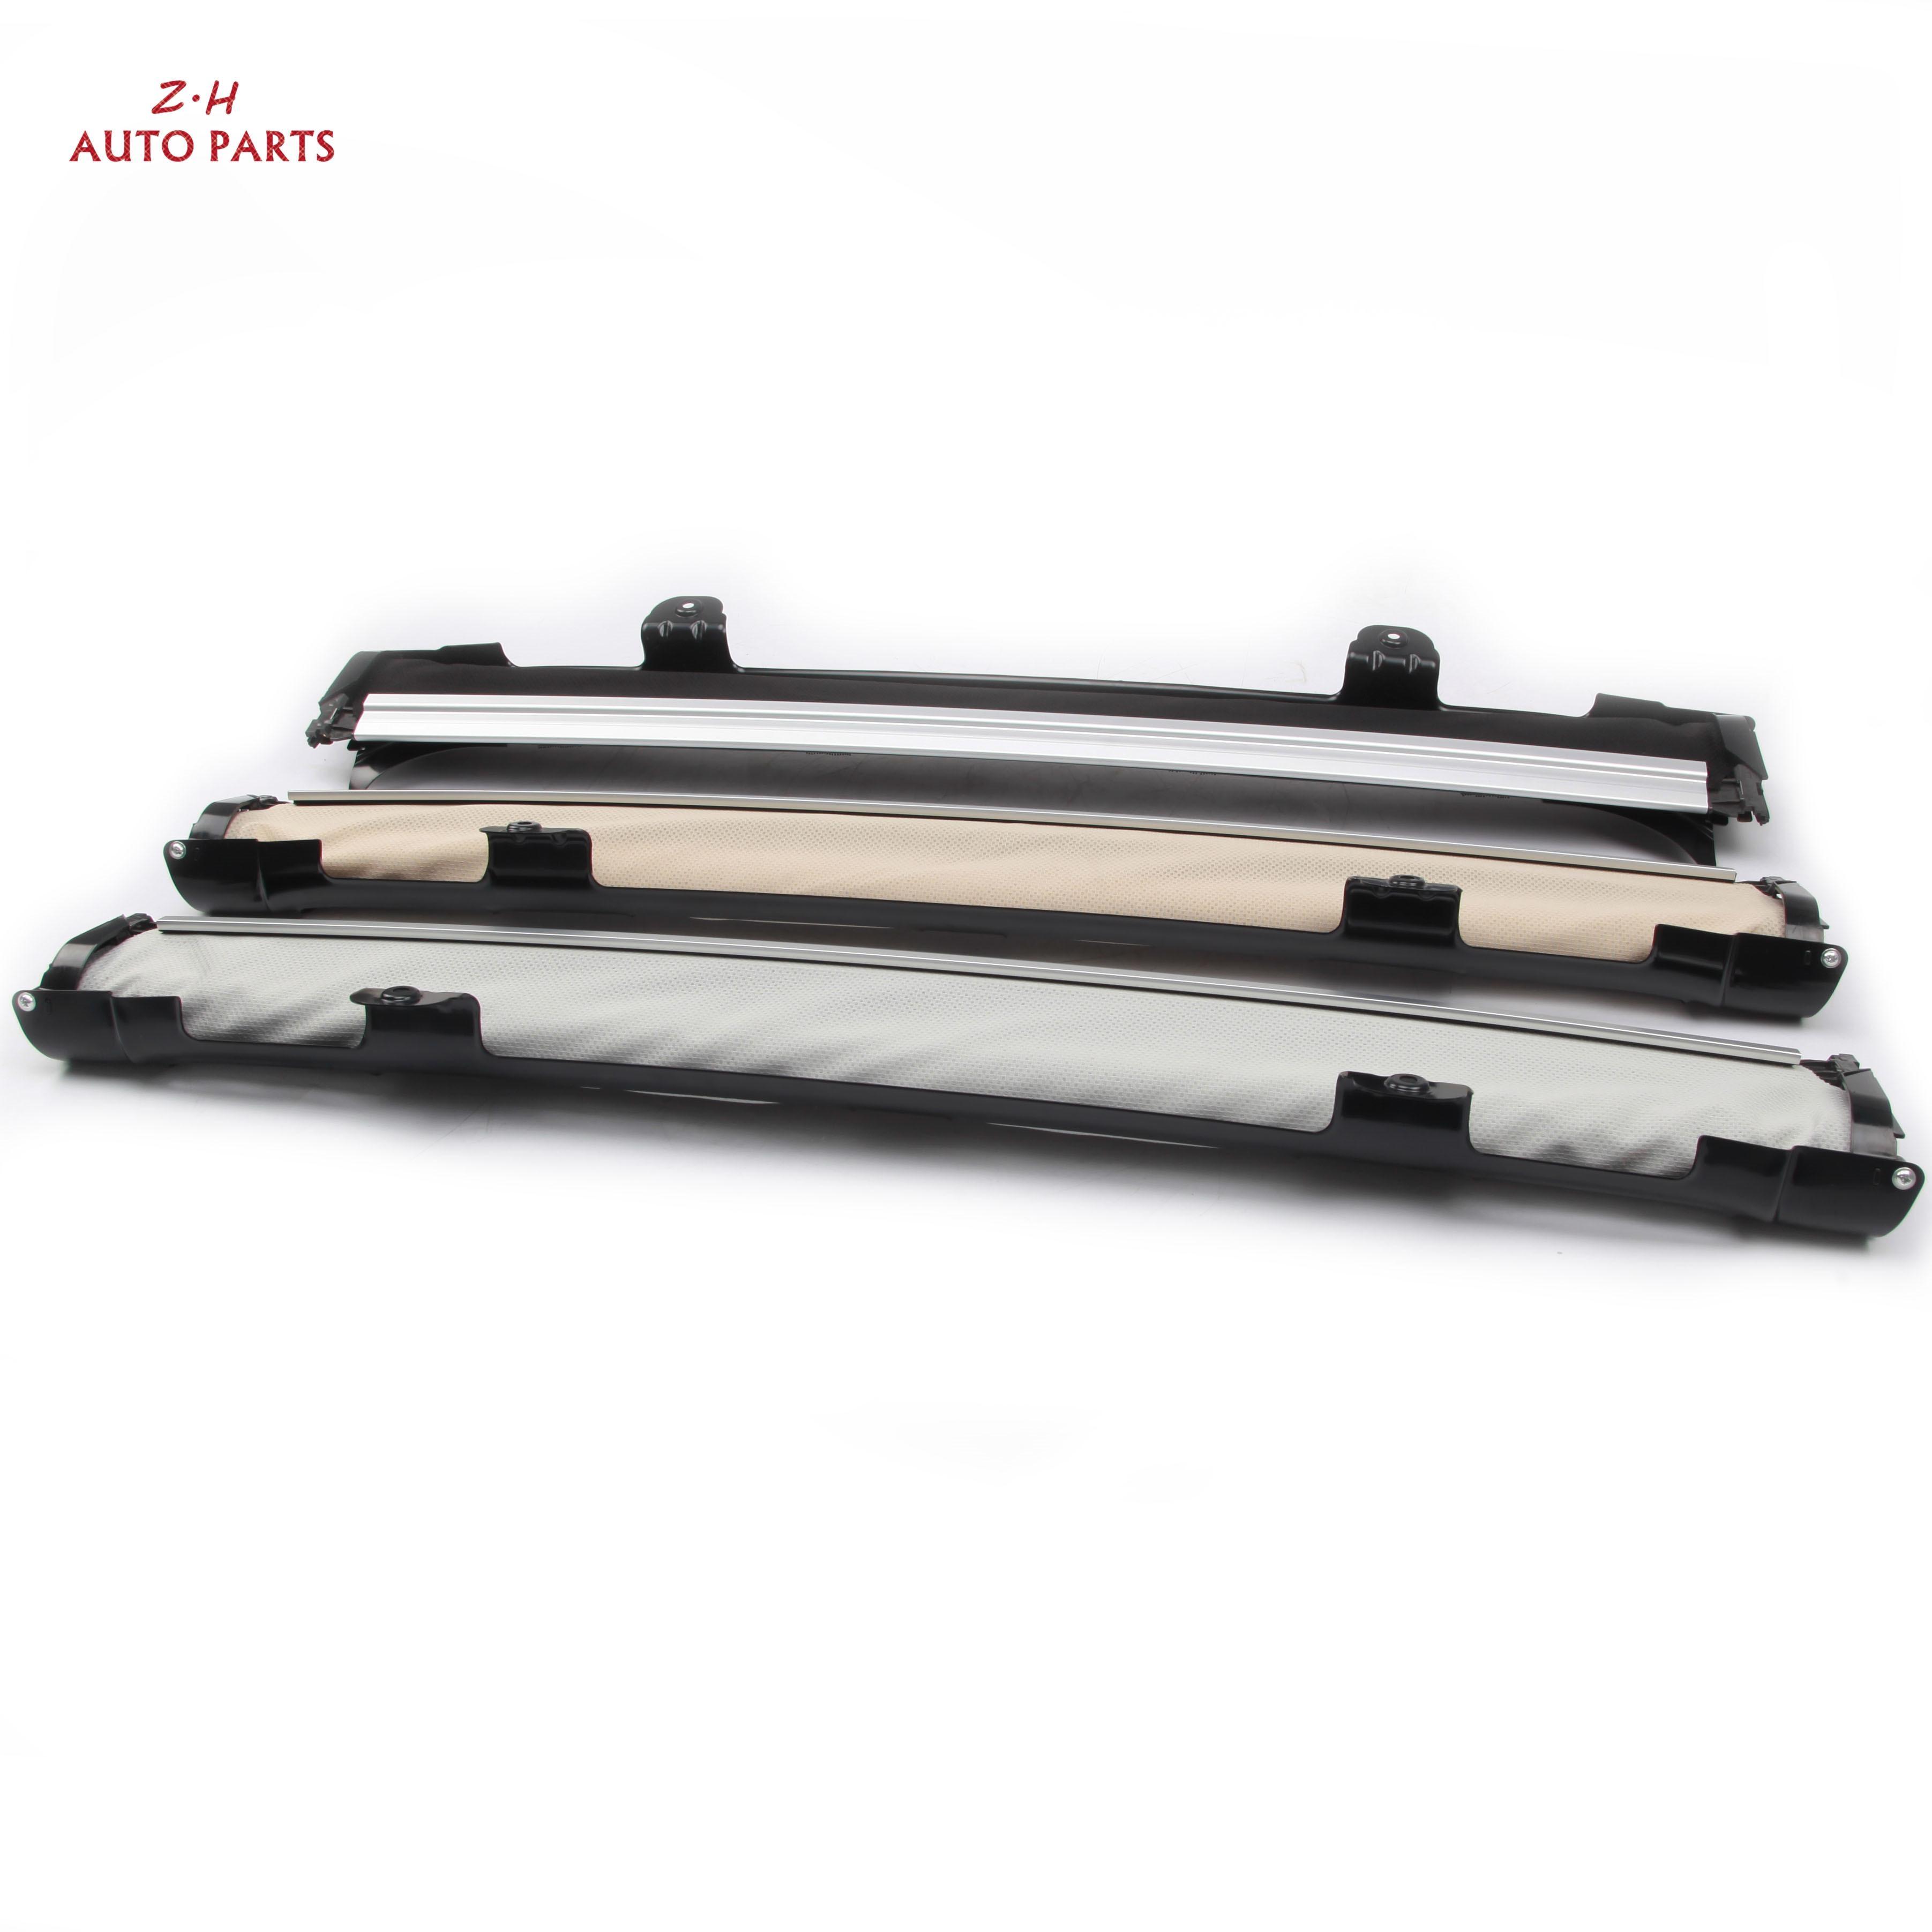 Nuevo conjunto de cortinas enrollables para techo solar 1K9877307DQB9, ventanas extraíbles Beige negro gris para Audi Q5 VW Passat Tiguan Skoda Seat